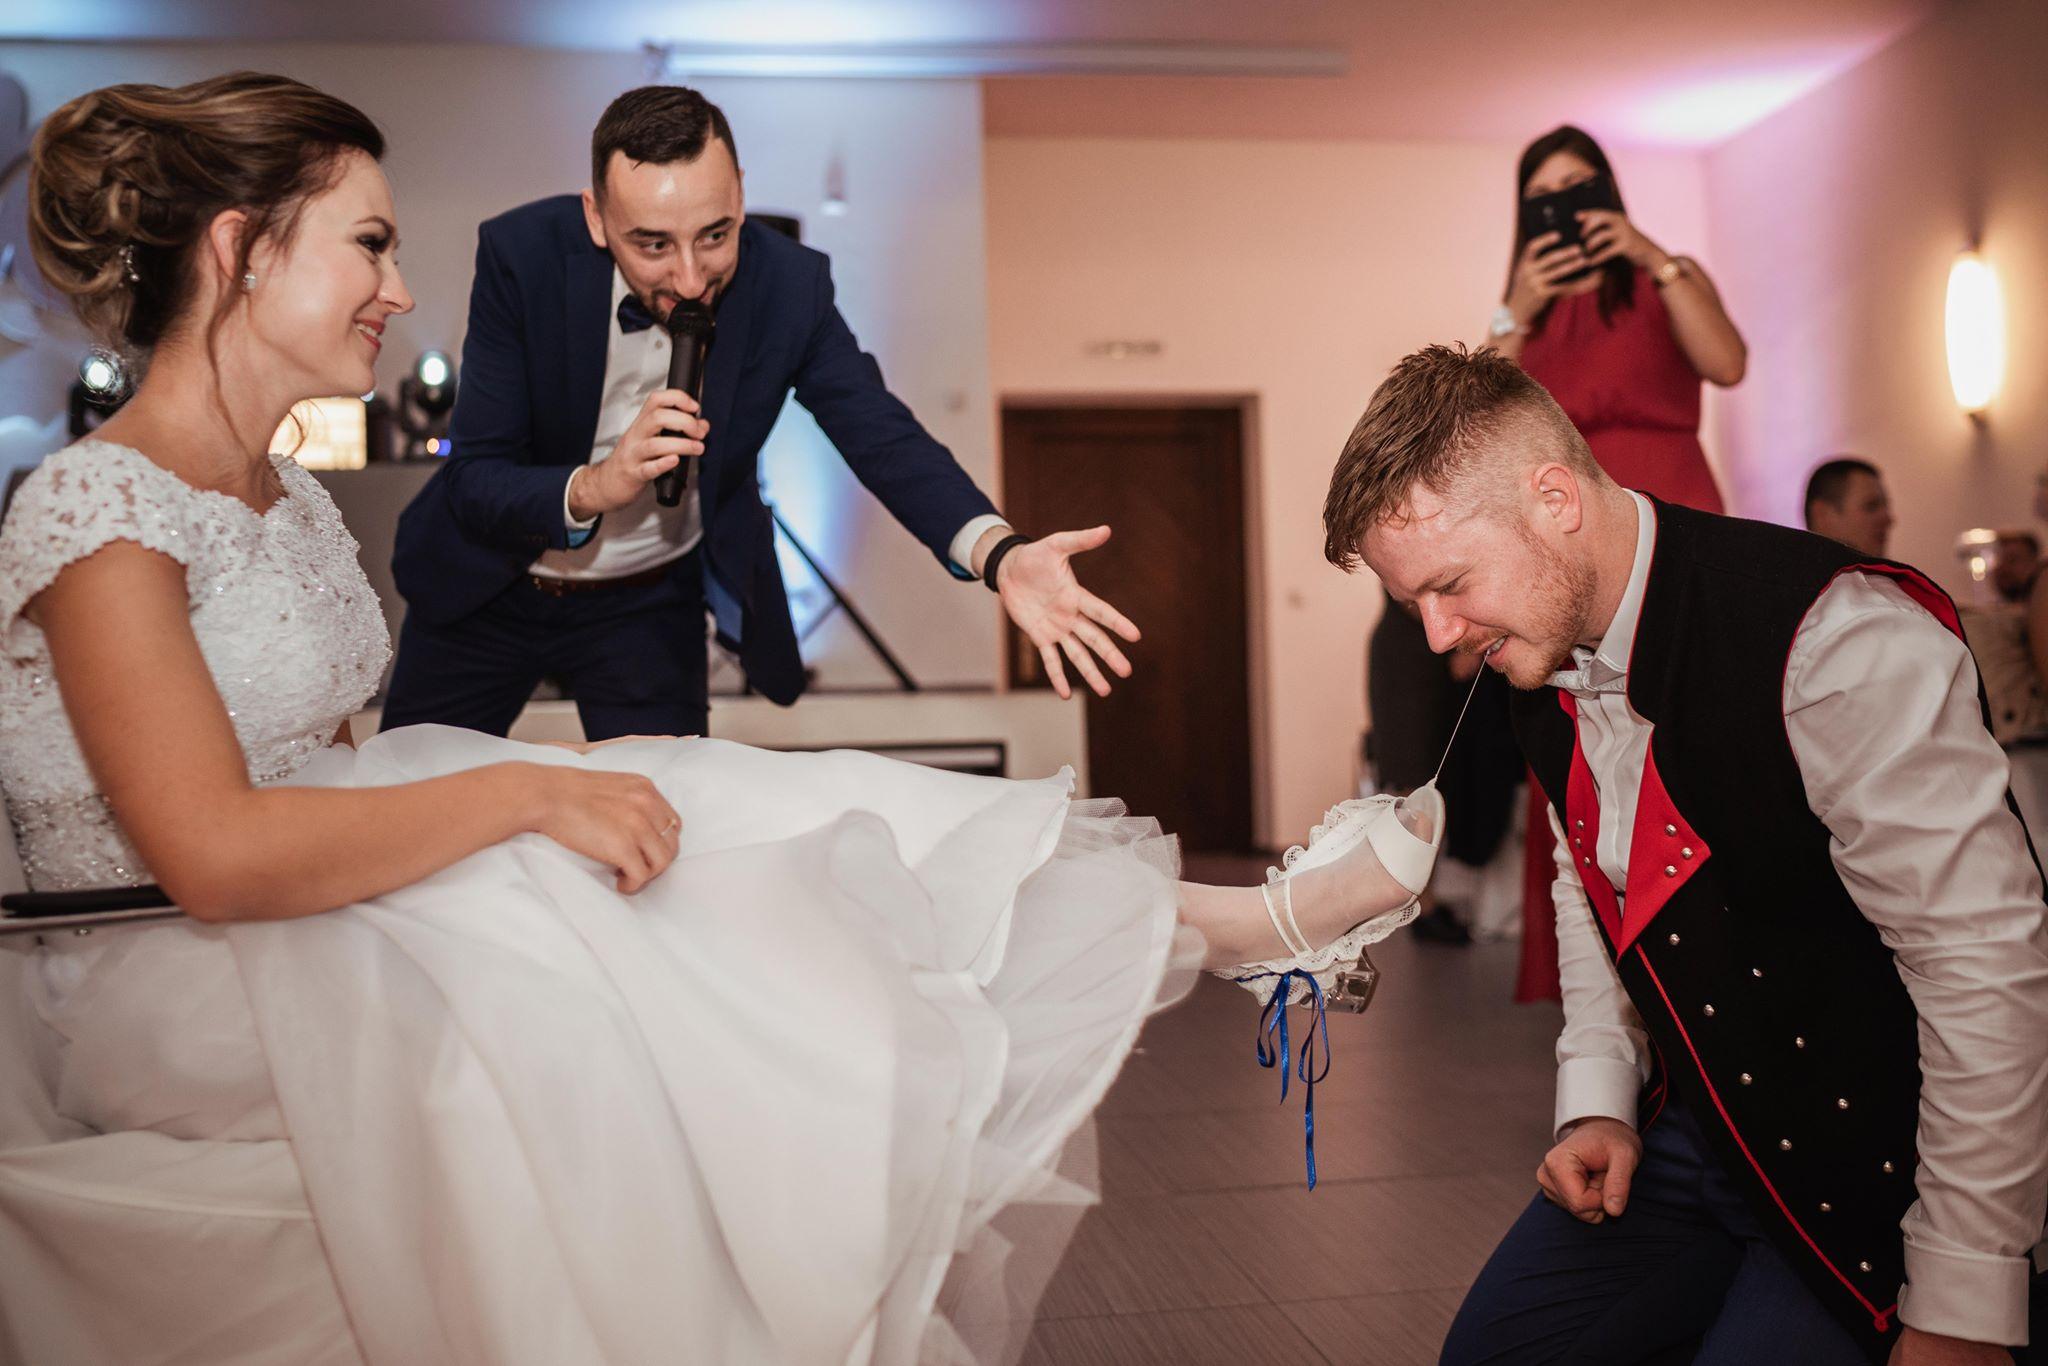 svadobna-hra-svadobna-stuaz-hladanie-zenicha-nevestyjpg